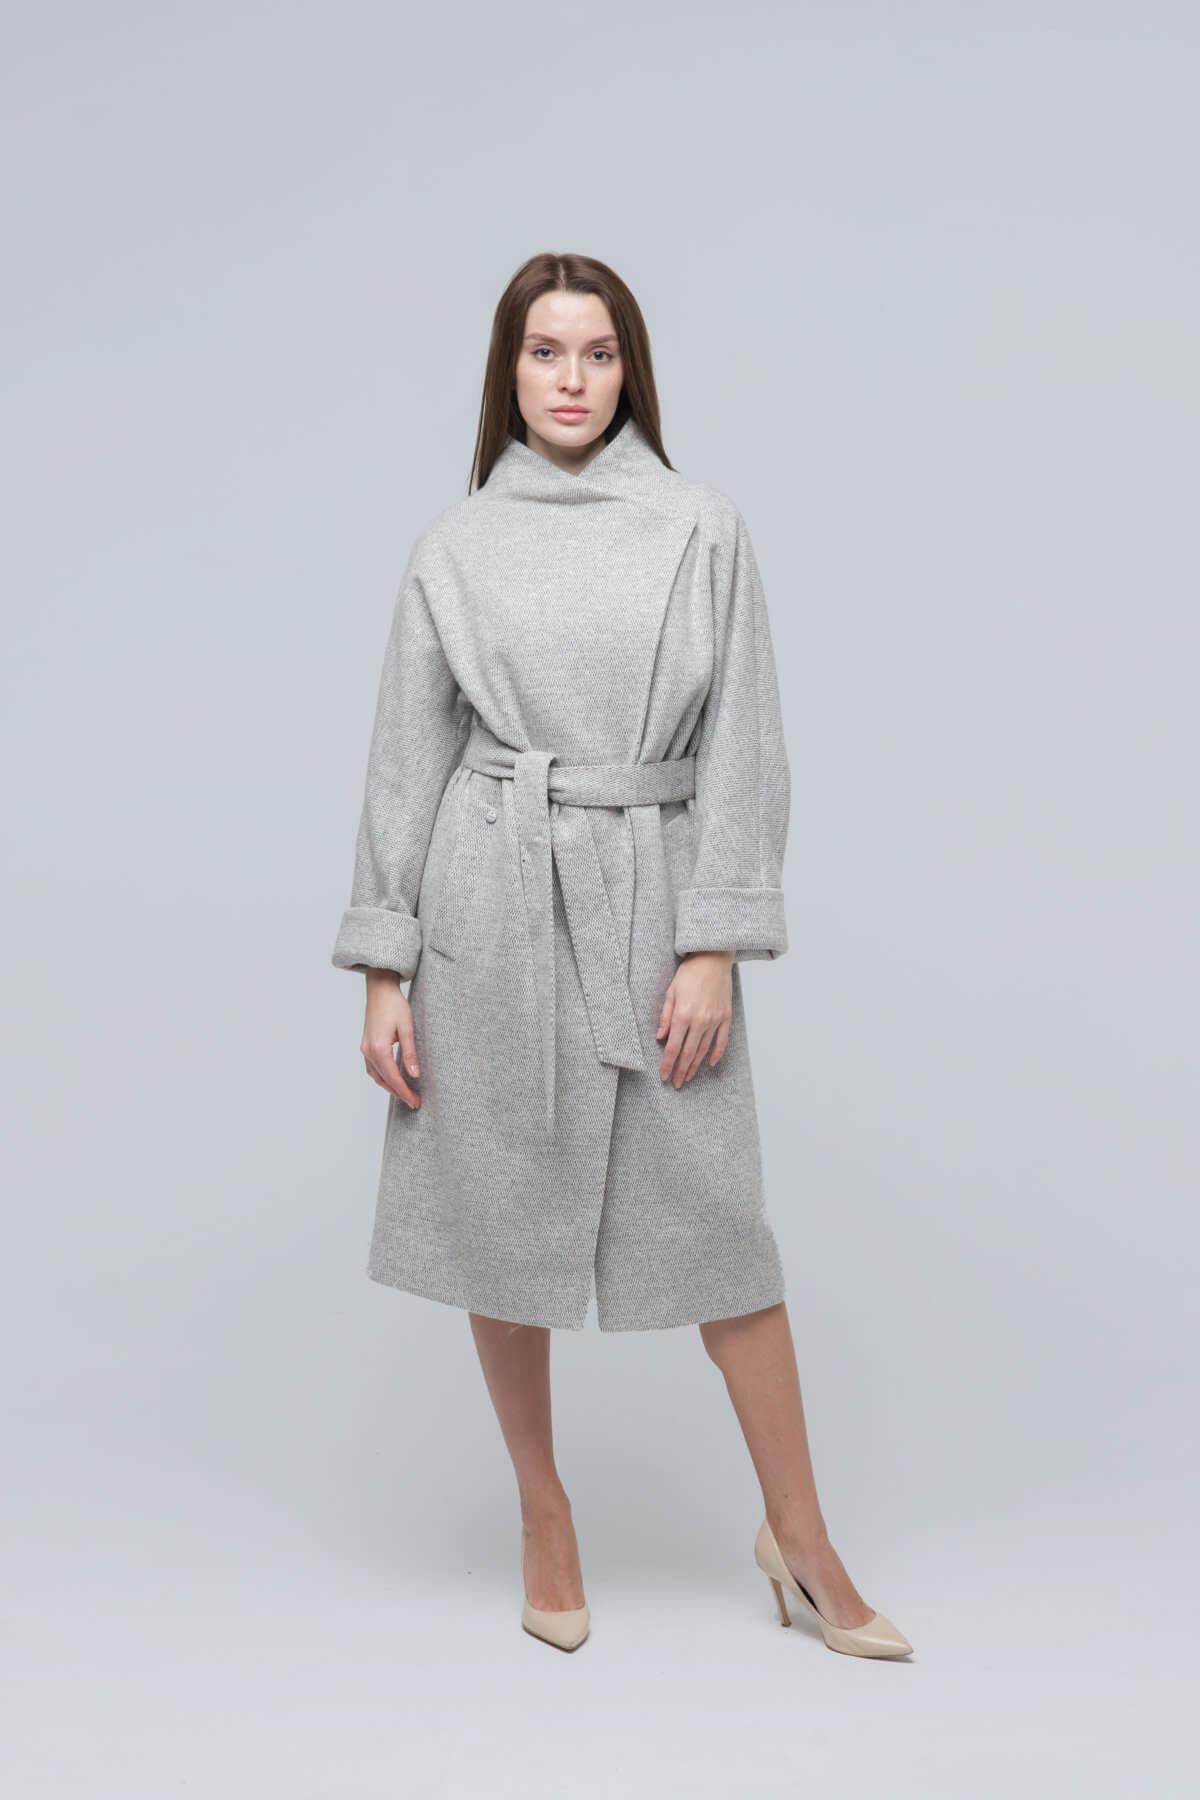 Пальто из текстиля. Фото 2